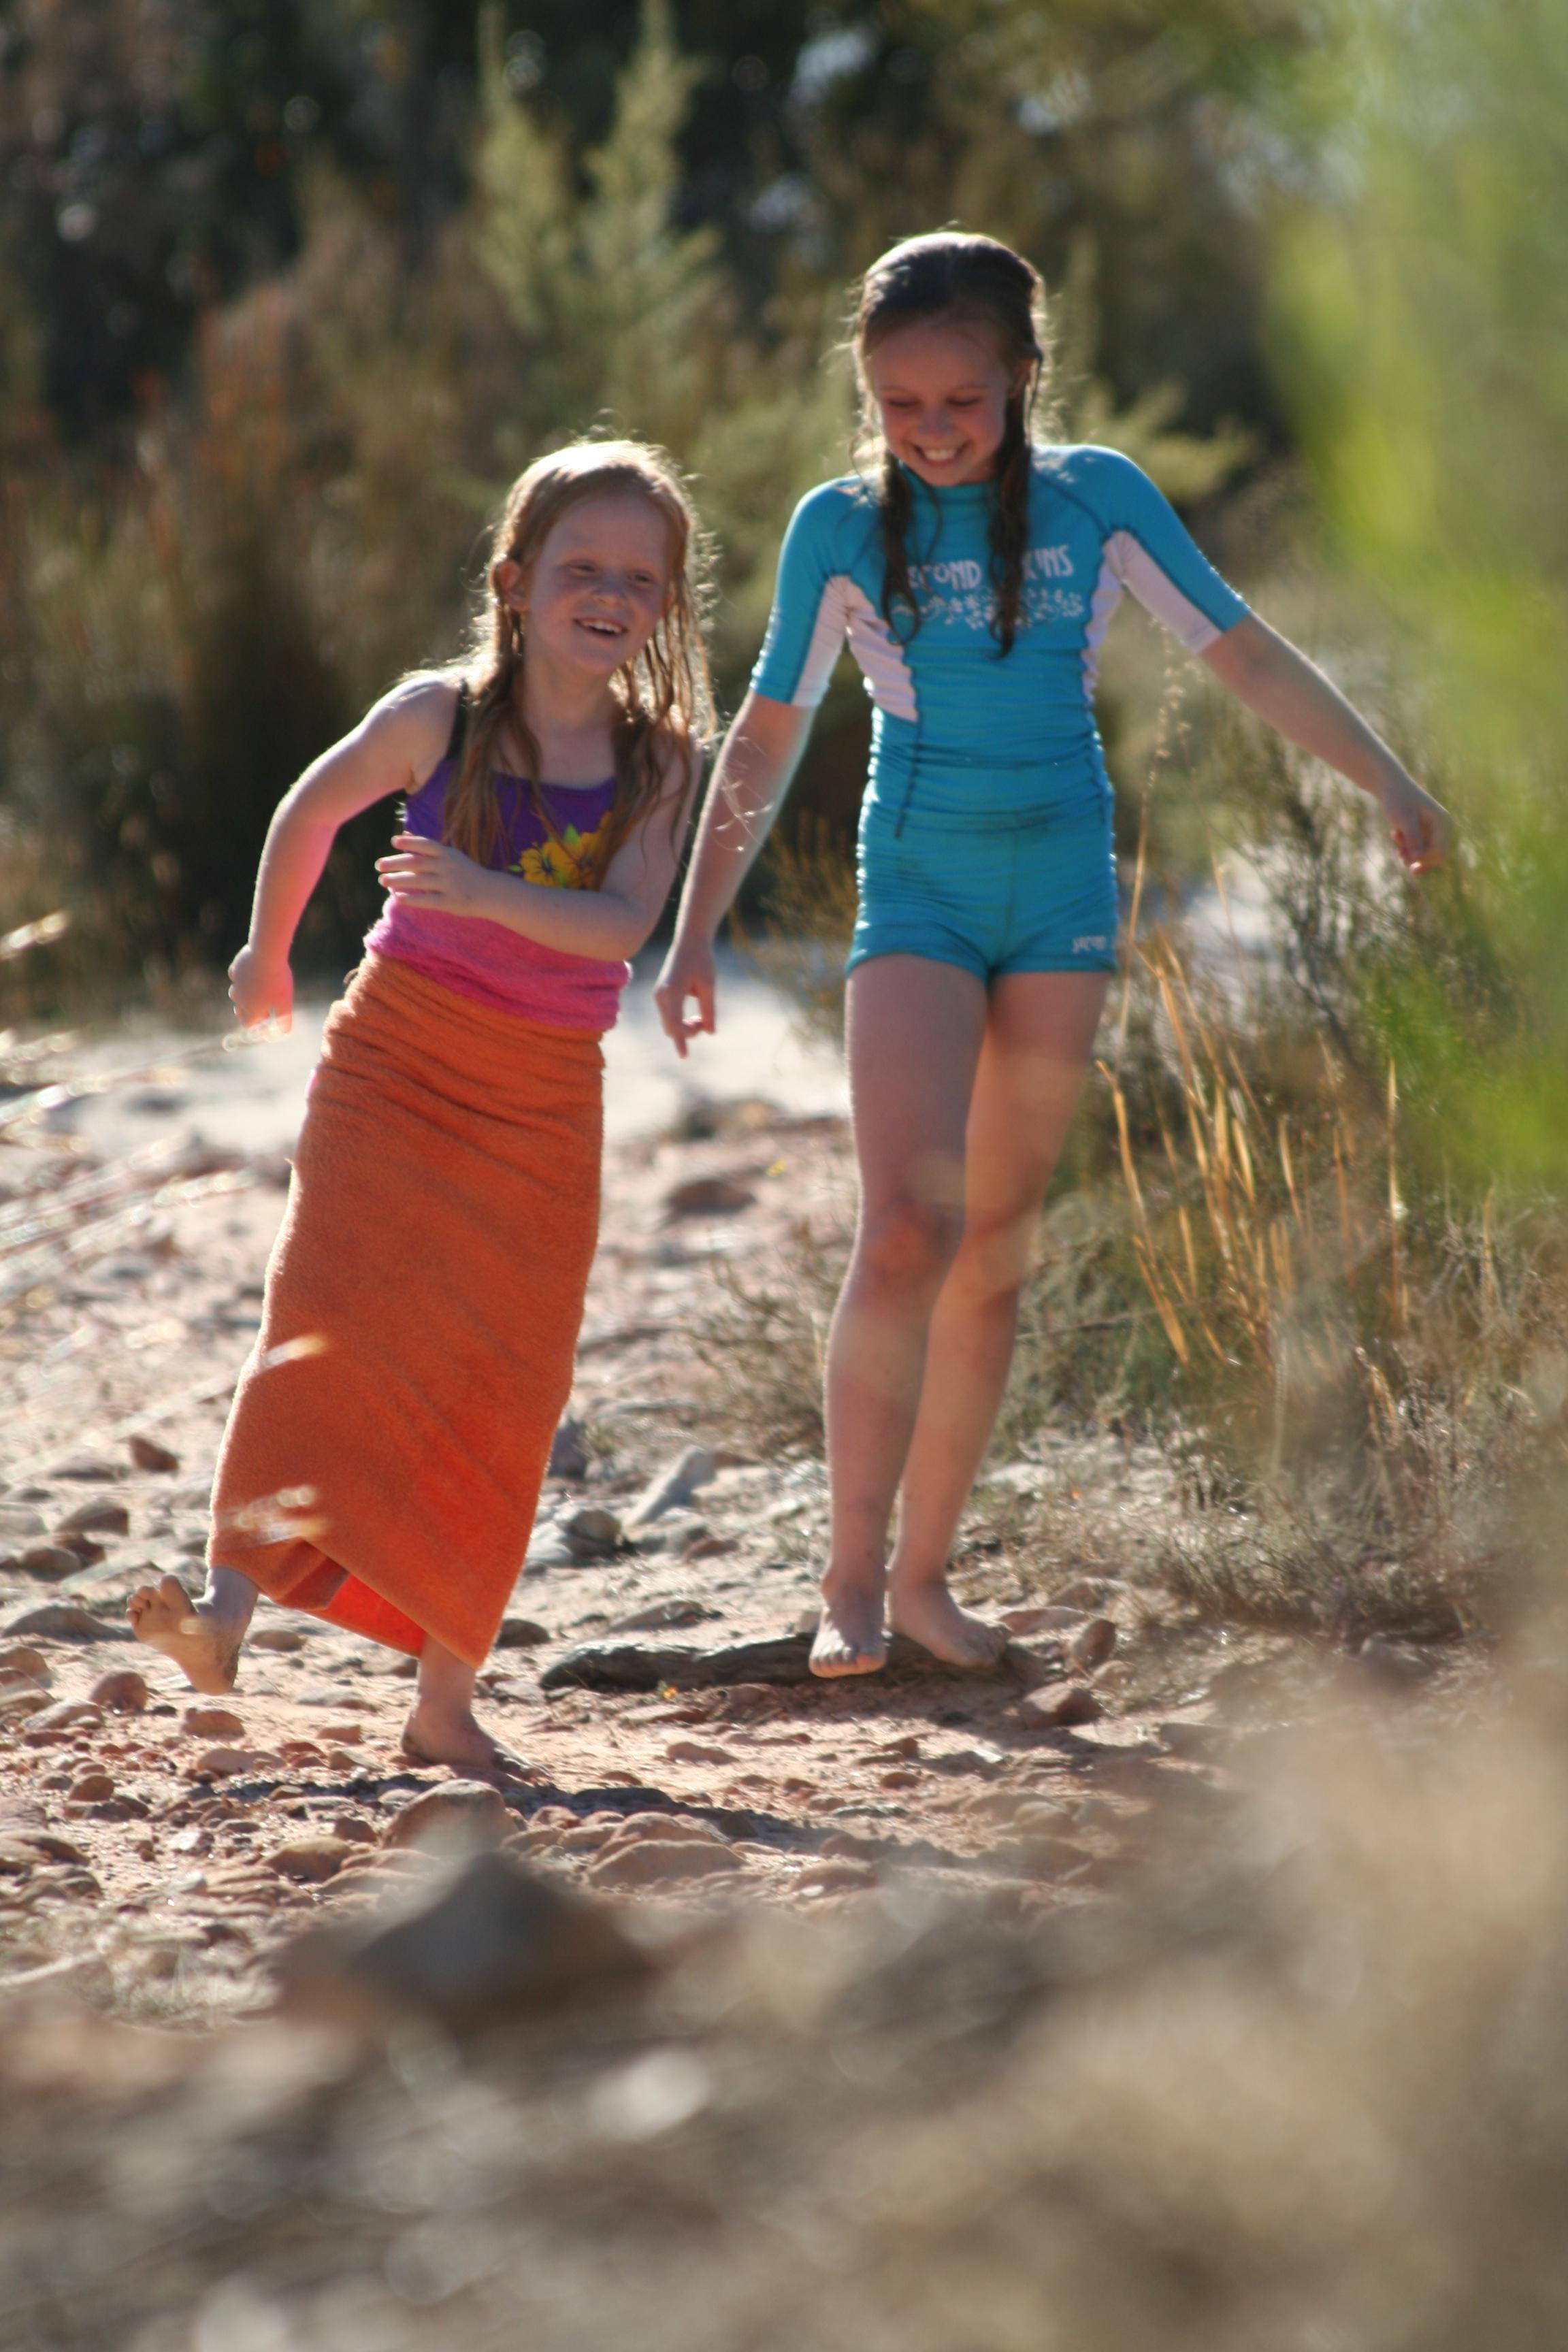 Girls walking on beach